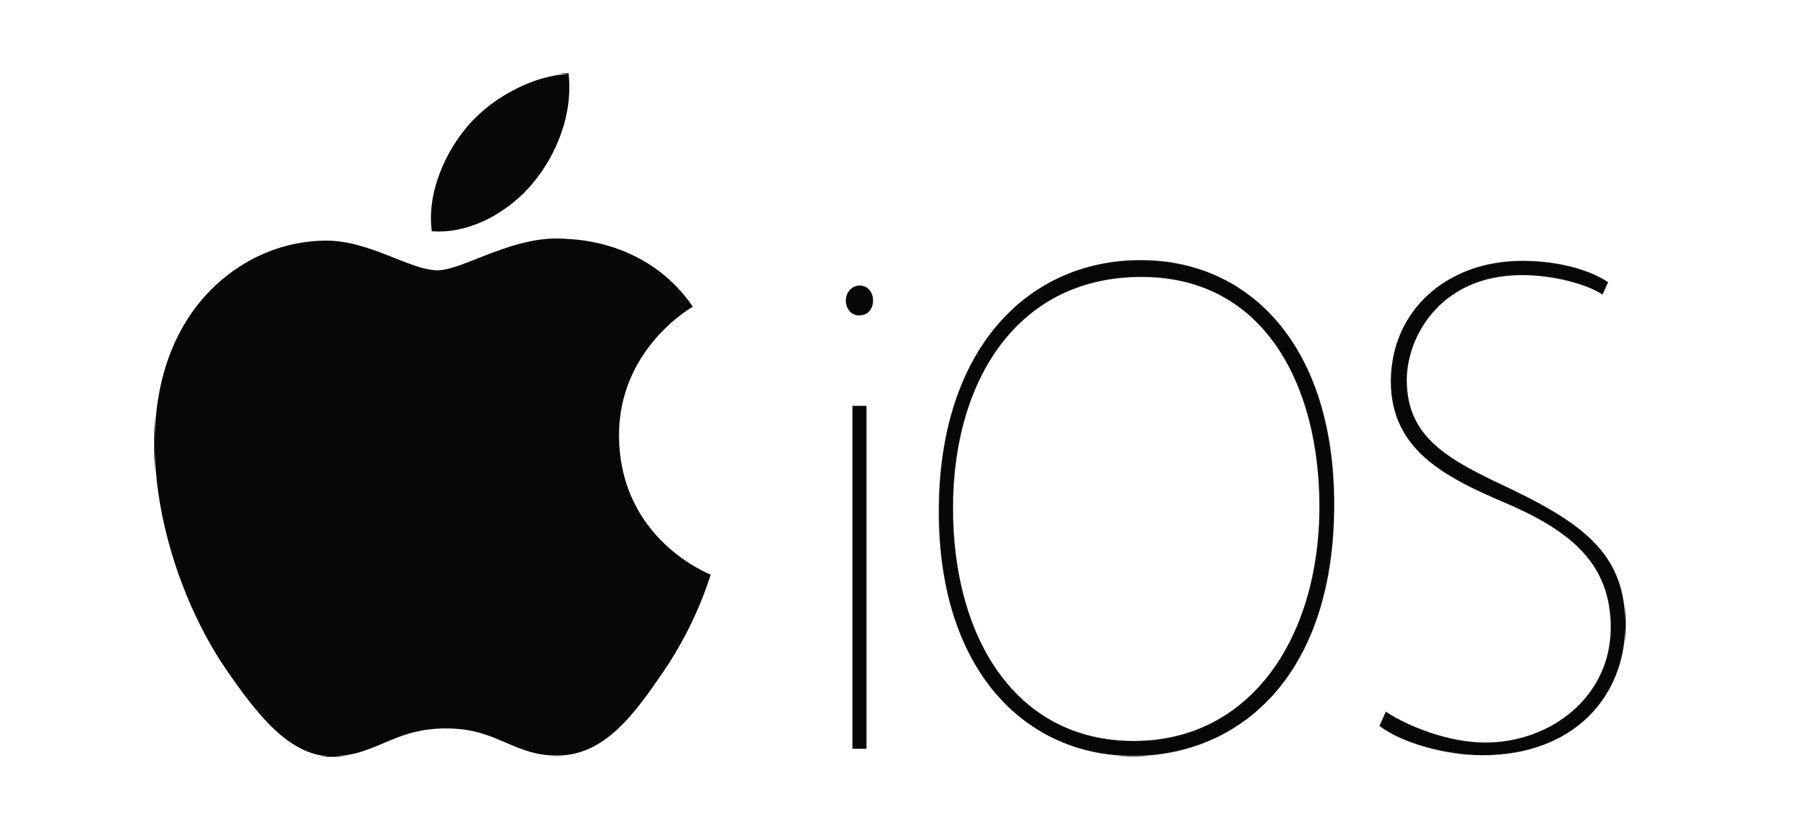 iOS 7 10 Emblem